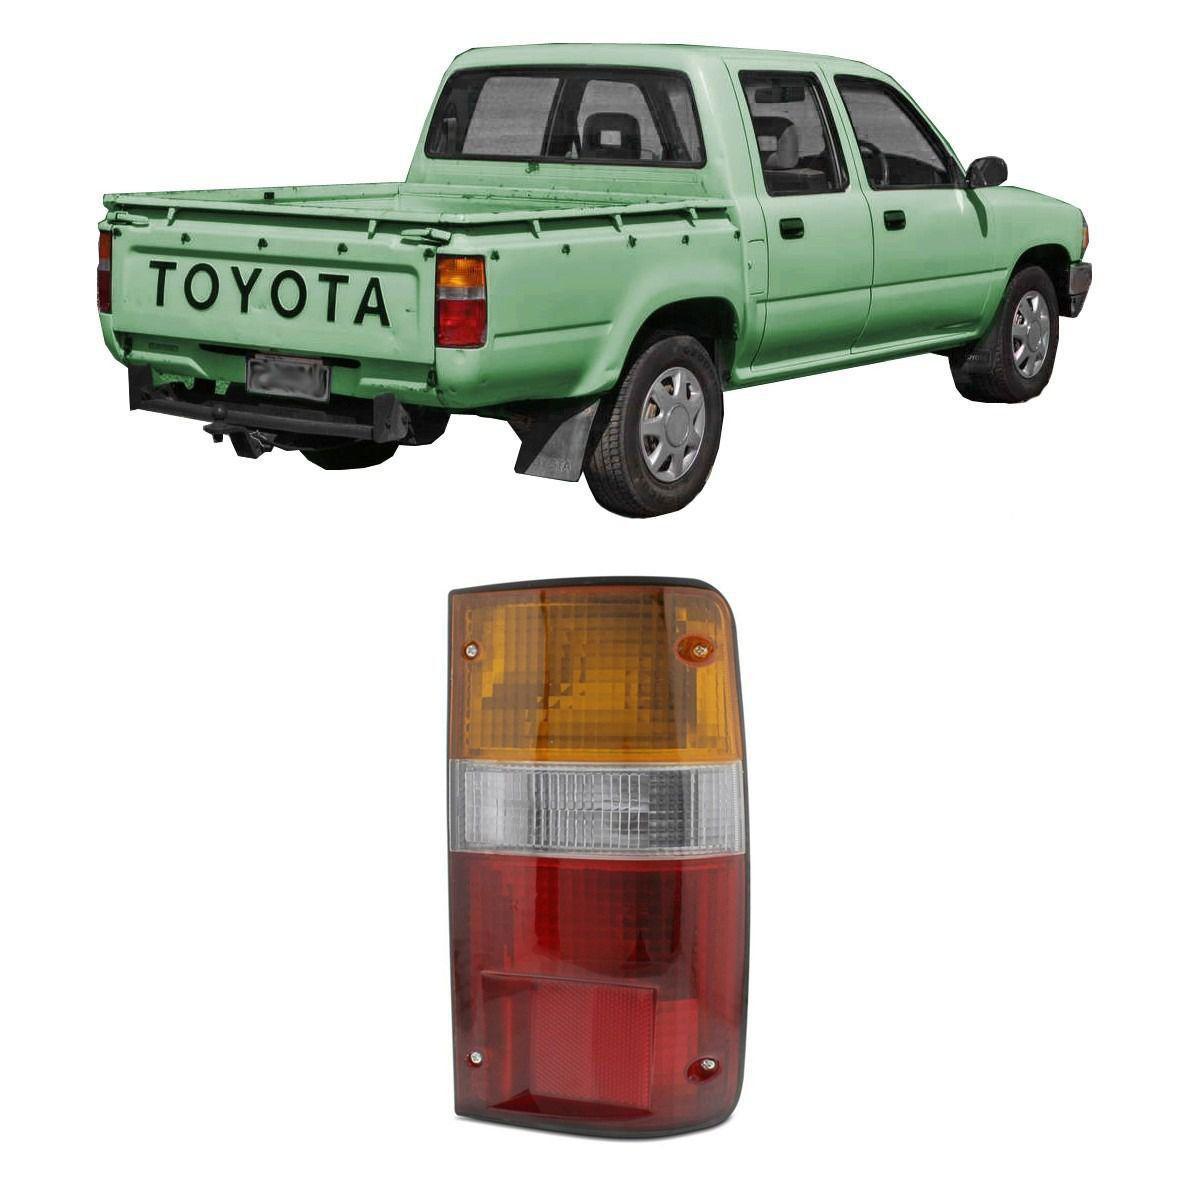 Lanterna Hilux 4x4 Pick Up 92 93 94 95 96 97 98 Tyc Produtos Para Carros Magazine Luiza